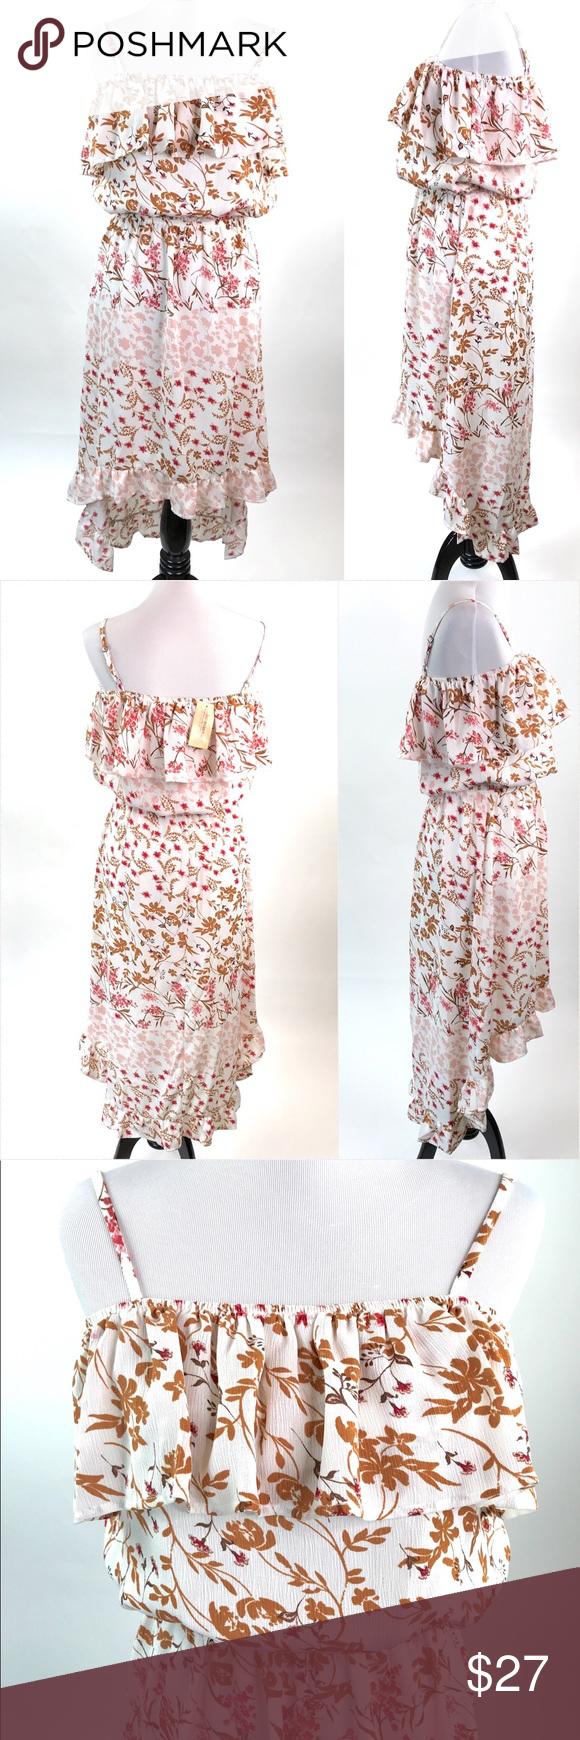 099fbb12ed American Rag Cie Floral High Low Dress Size Medium American Rag Cie Dress  Size Medium Floral